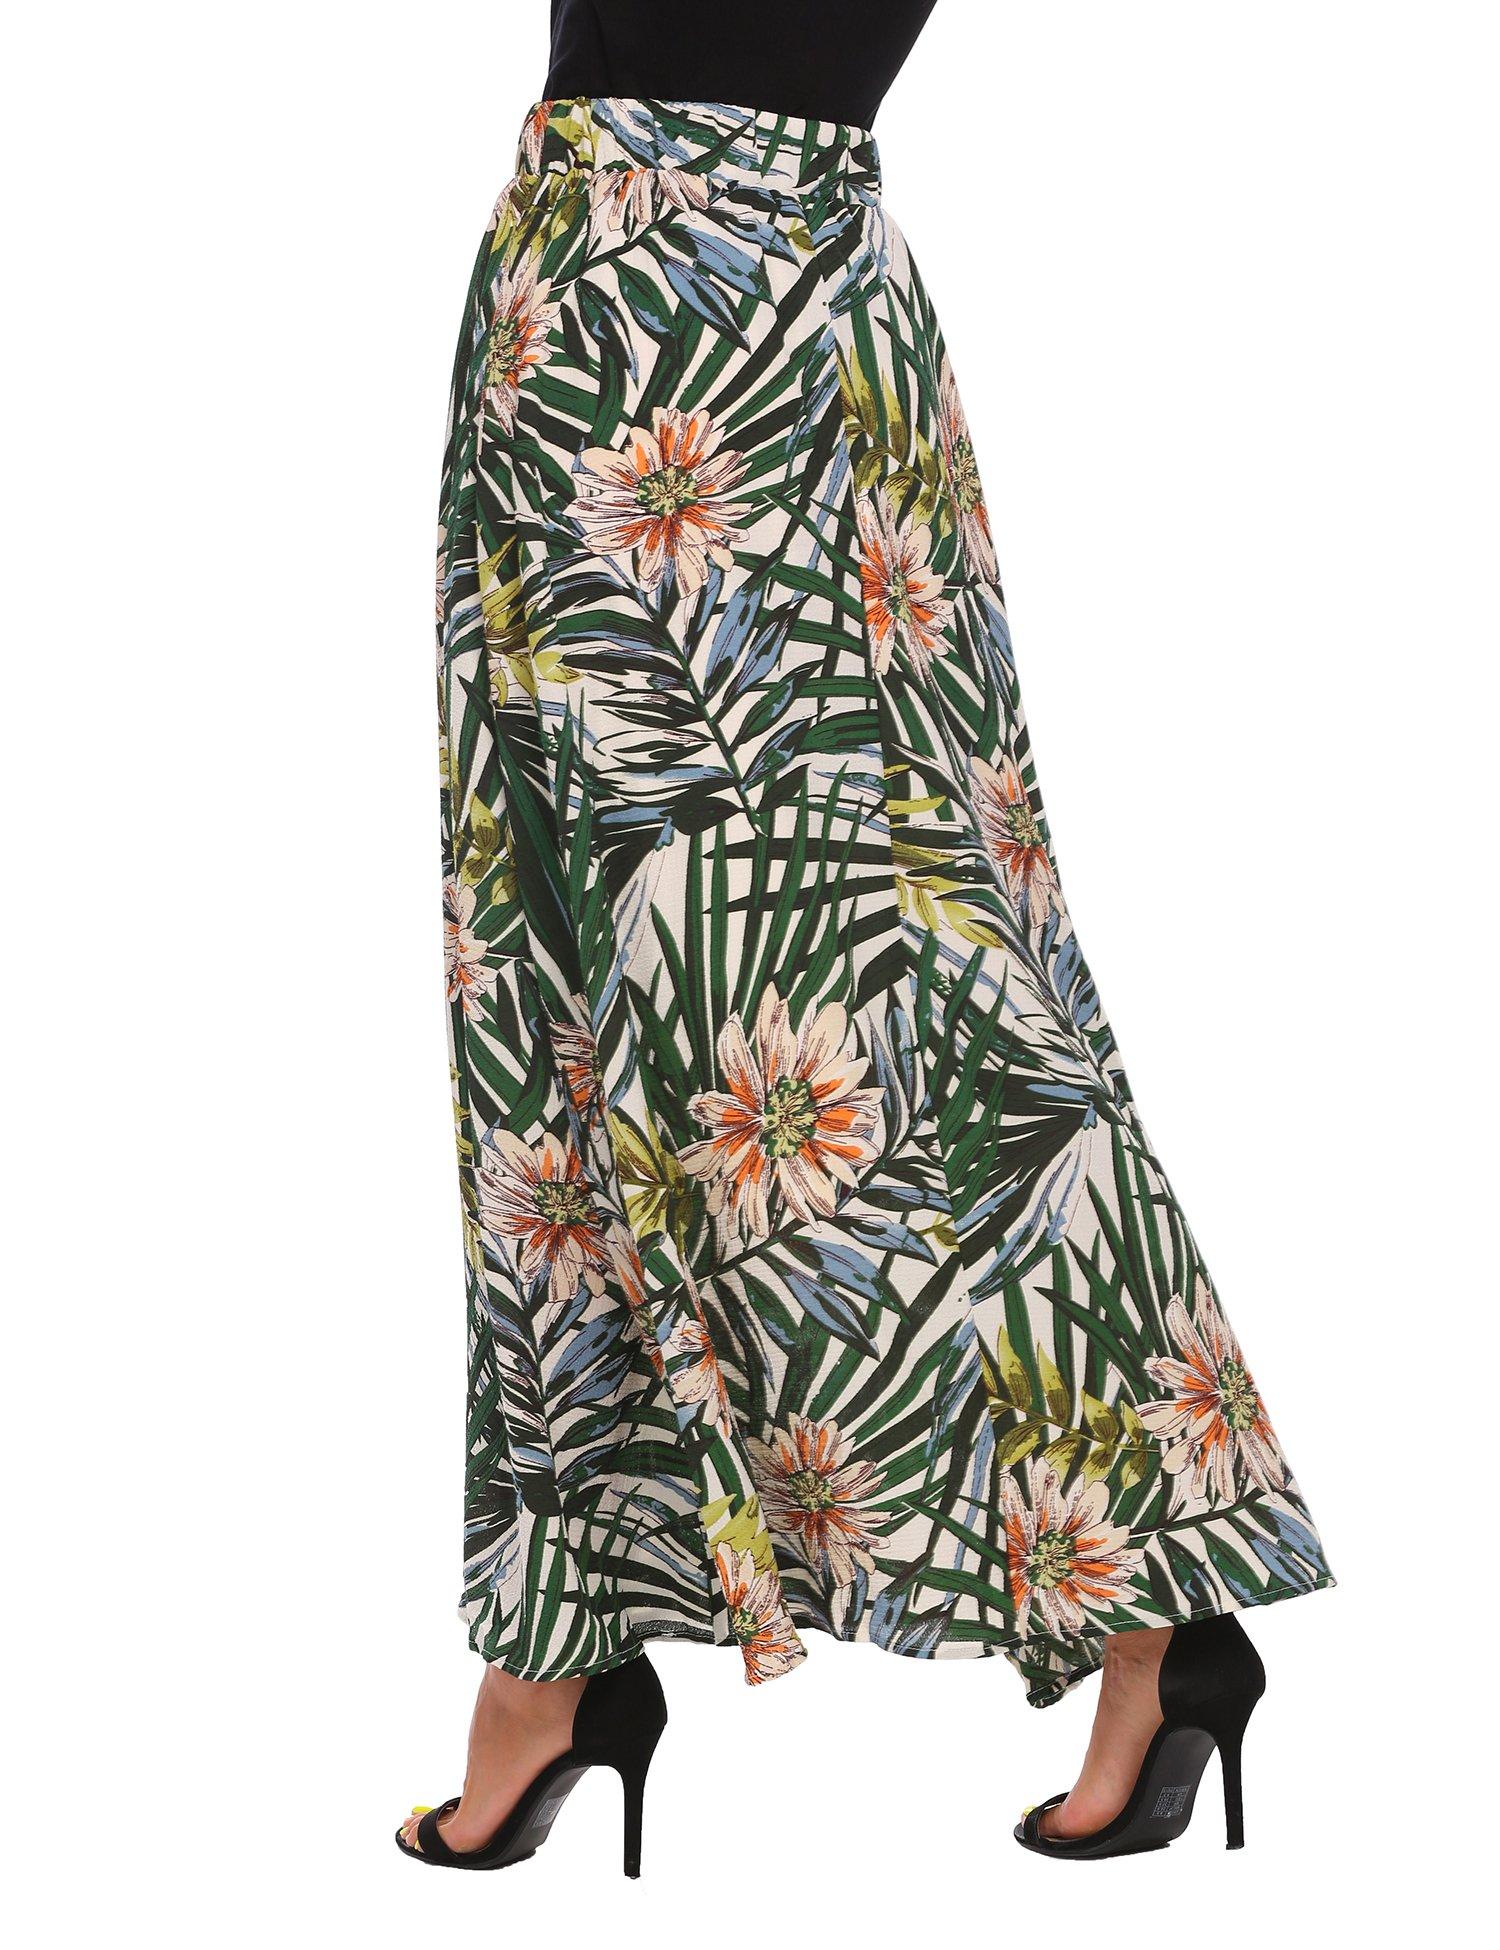 Zeagoo Women African Boho Floral Print High Waist Beach Party Bohemia Long Maxi Skirt, Green, X-Large